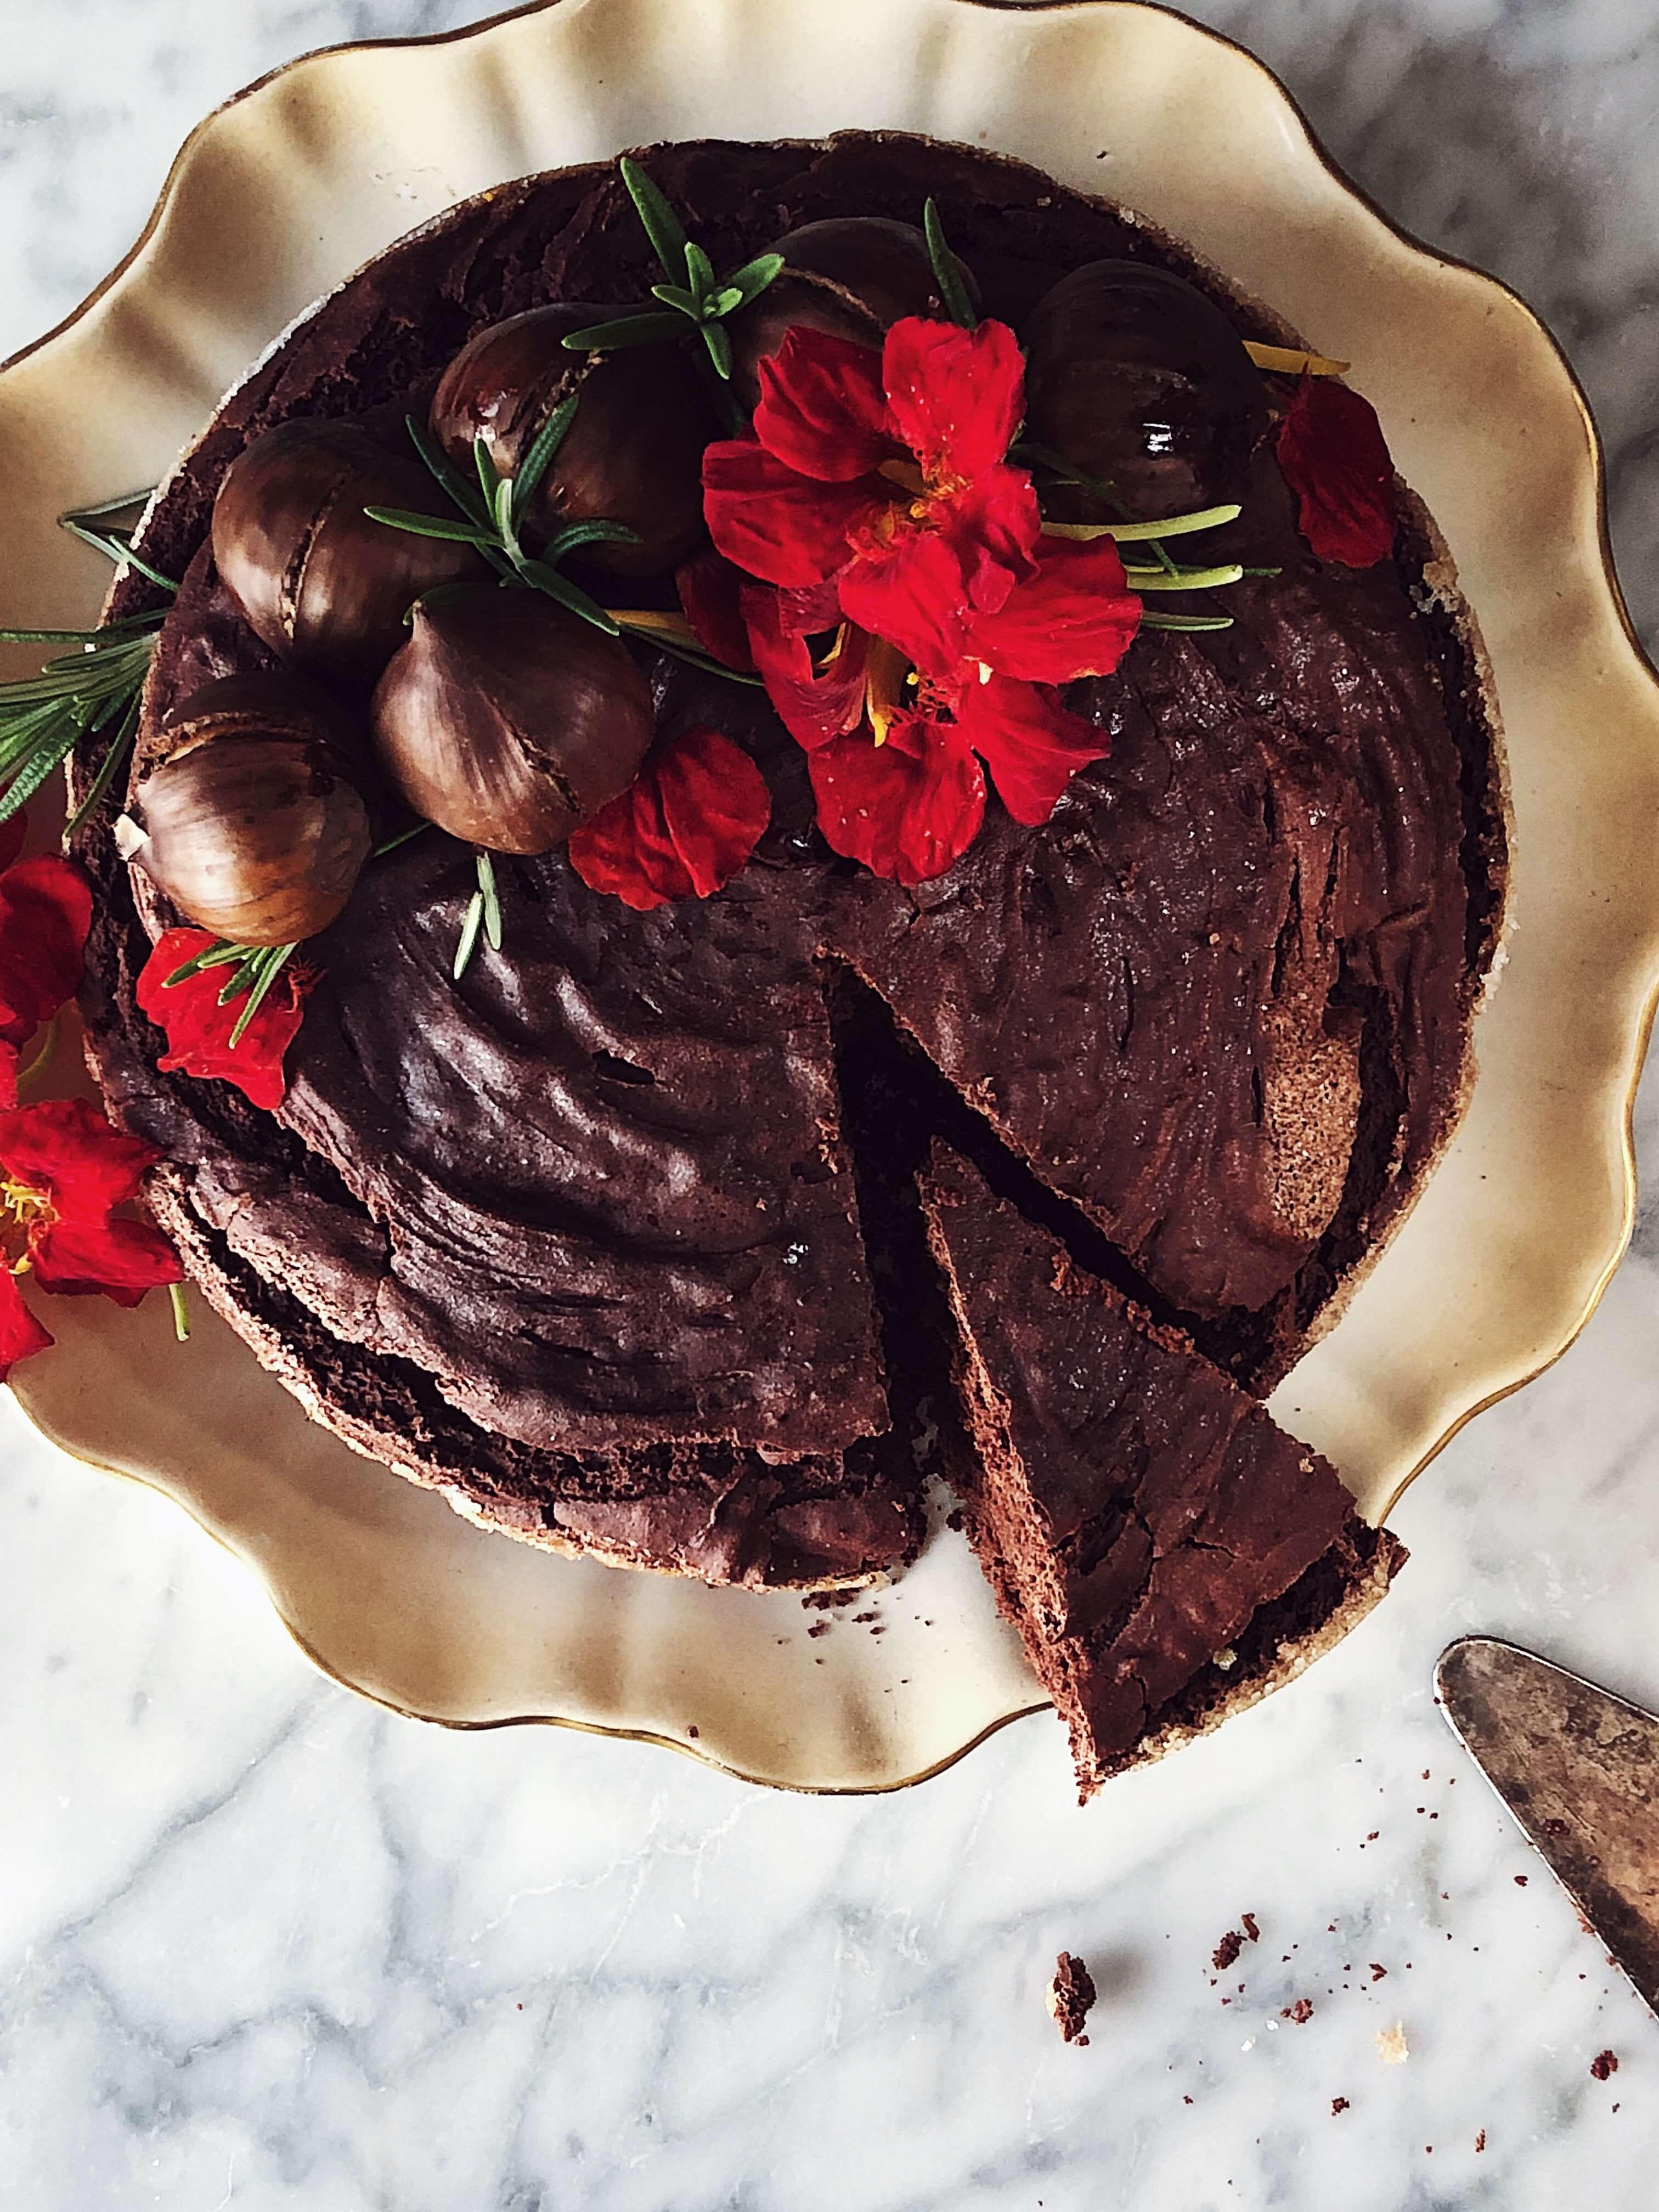 Italian cuisine magazine: chestnut cake #thegourmetmag #italy